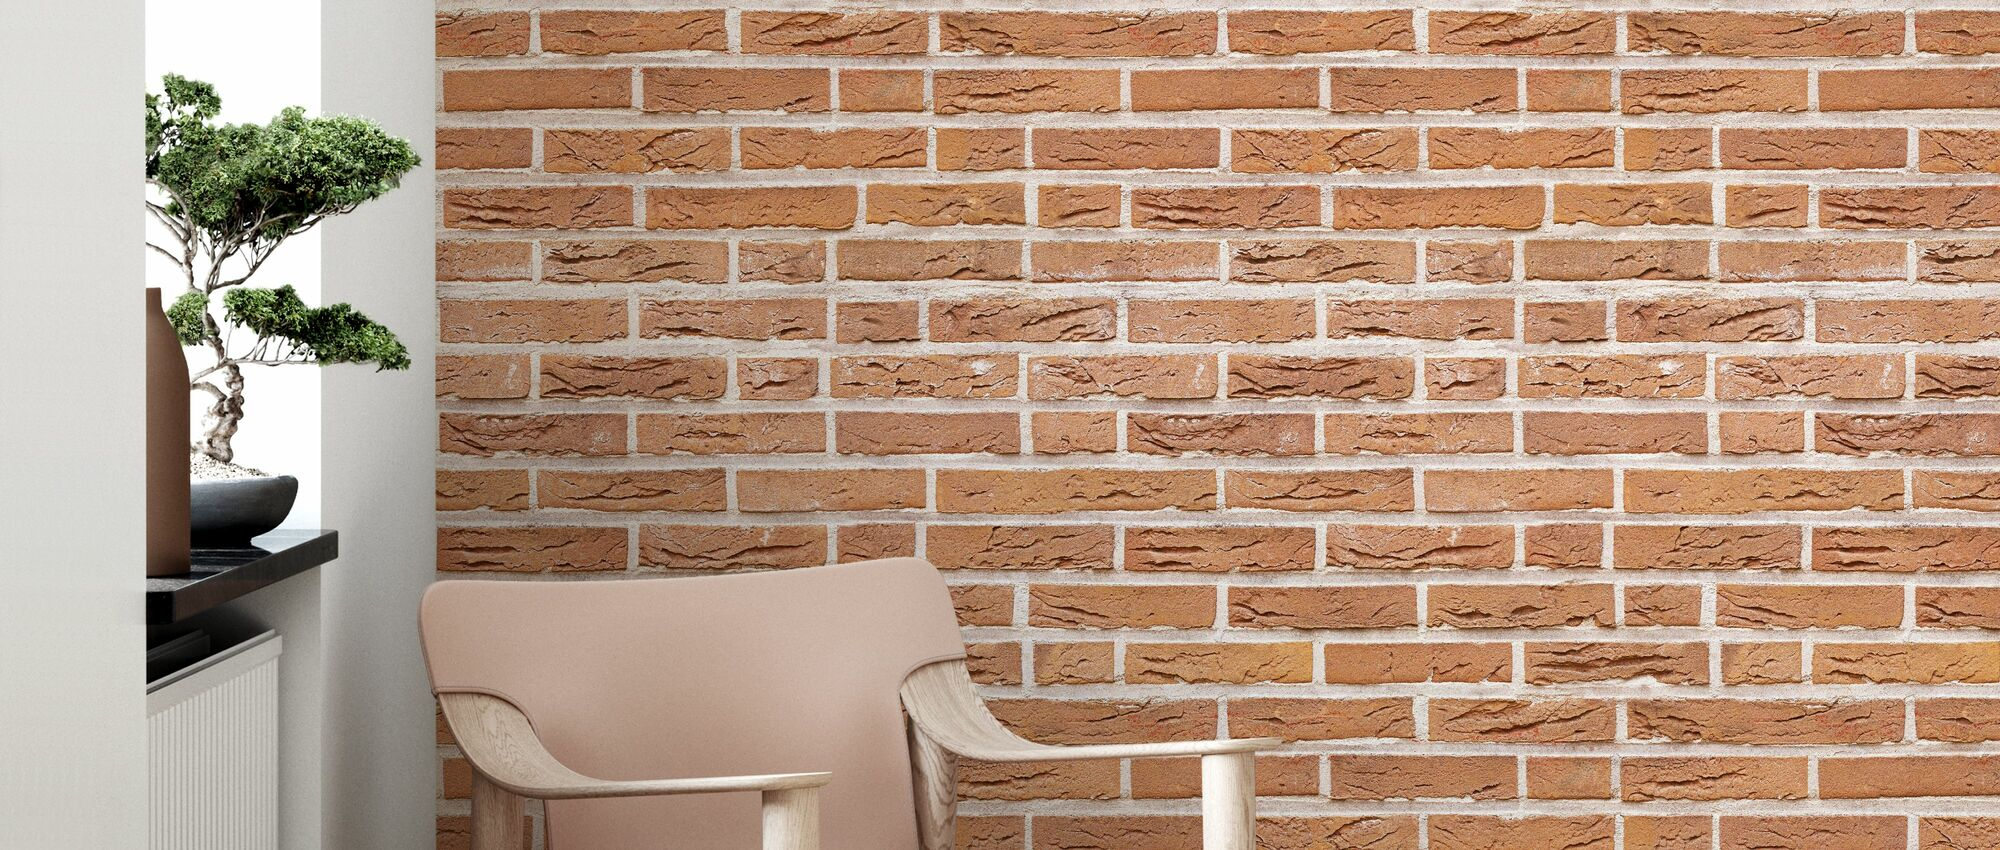 Orange Brick Wall - Wallpaper - Living Room